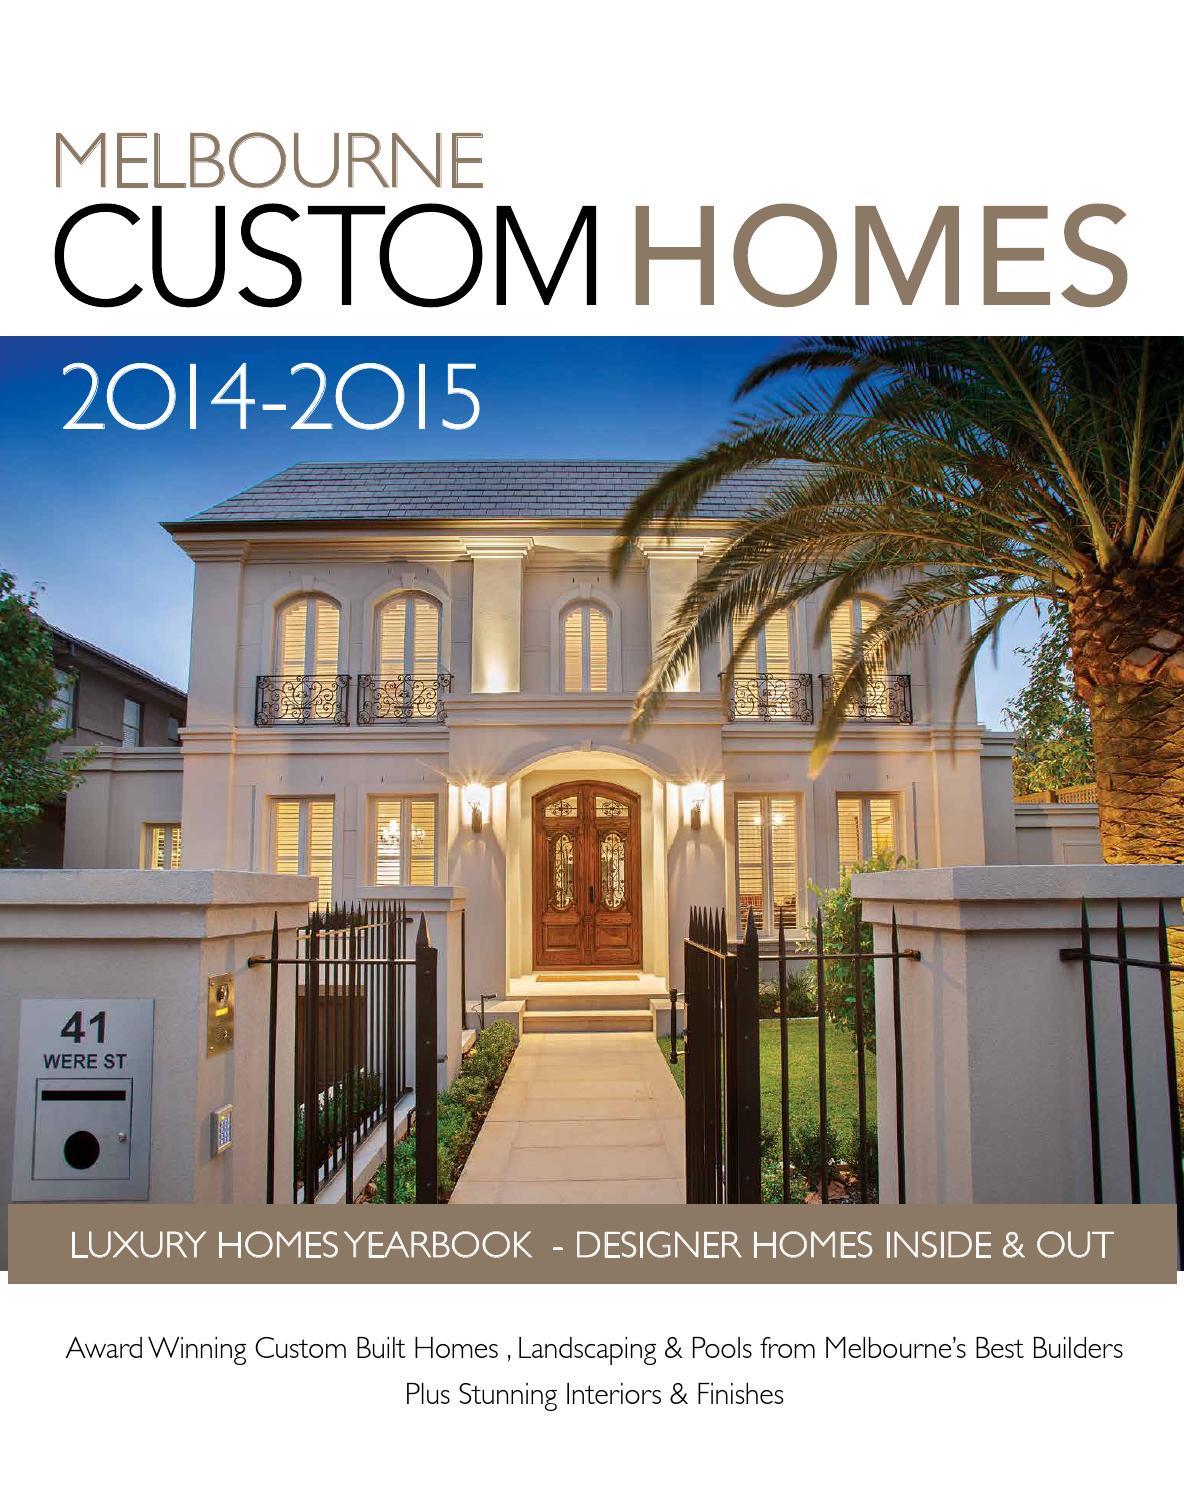 Melbourne Custom Homes 2014 2015